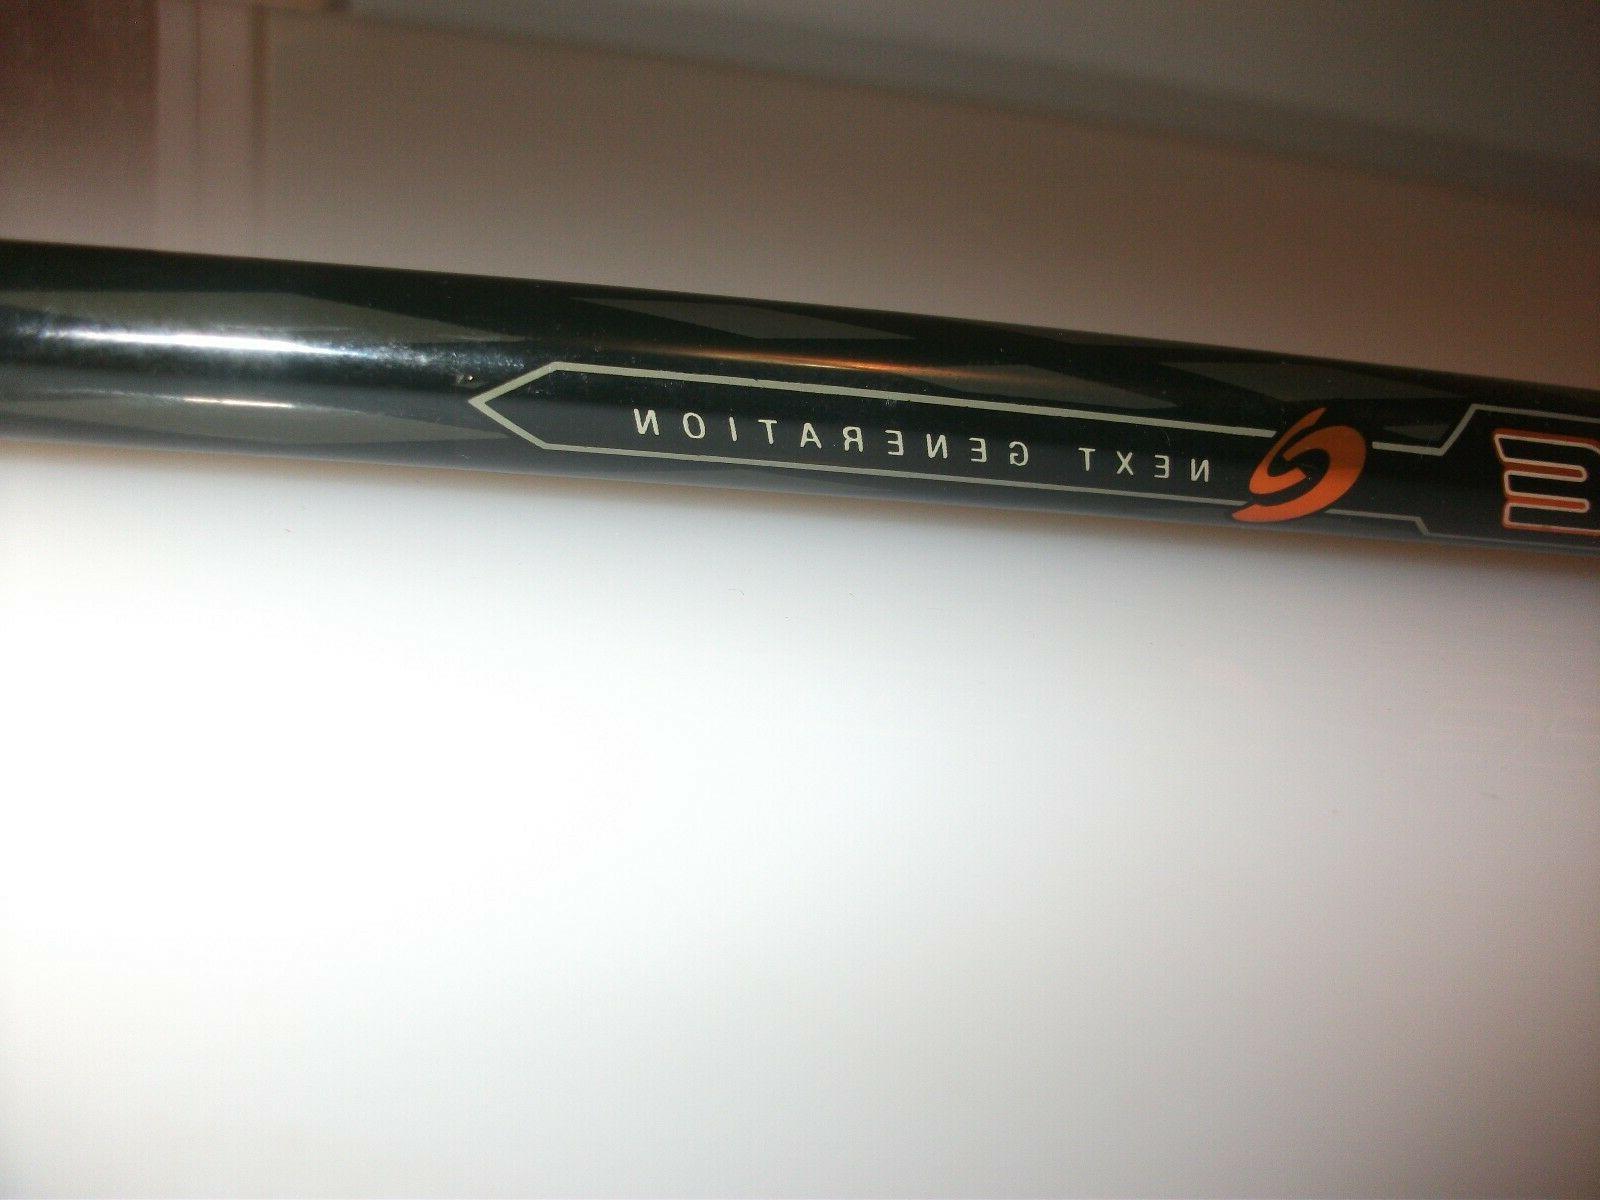 1990s Spinning Rod 24 VGC76-7